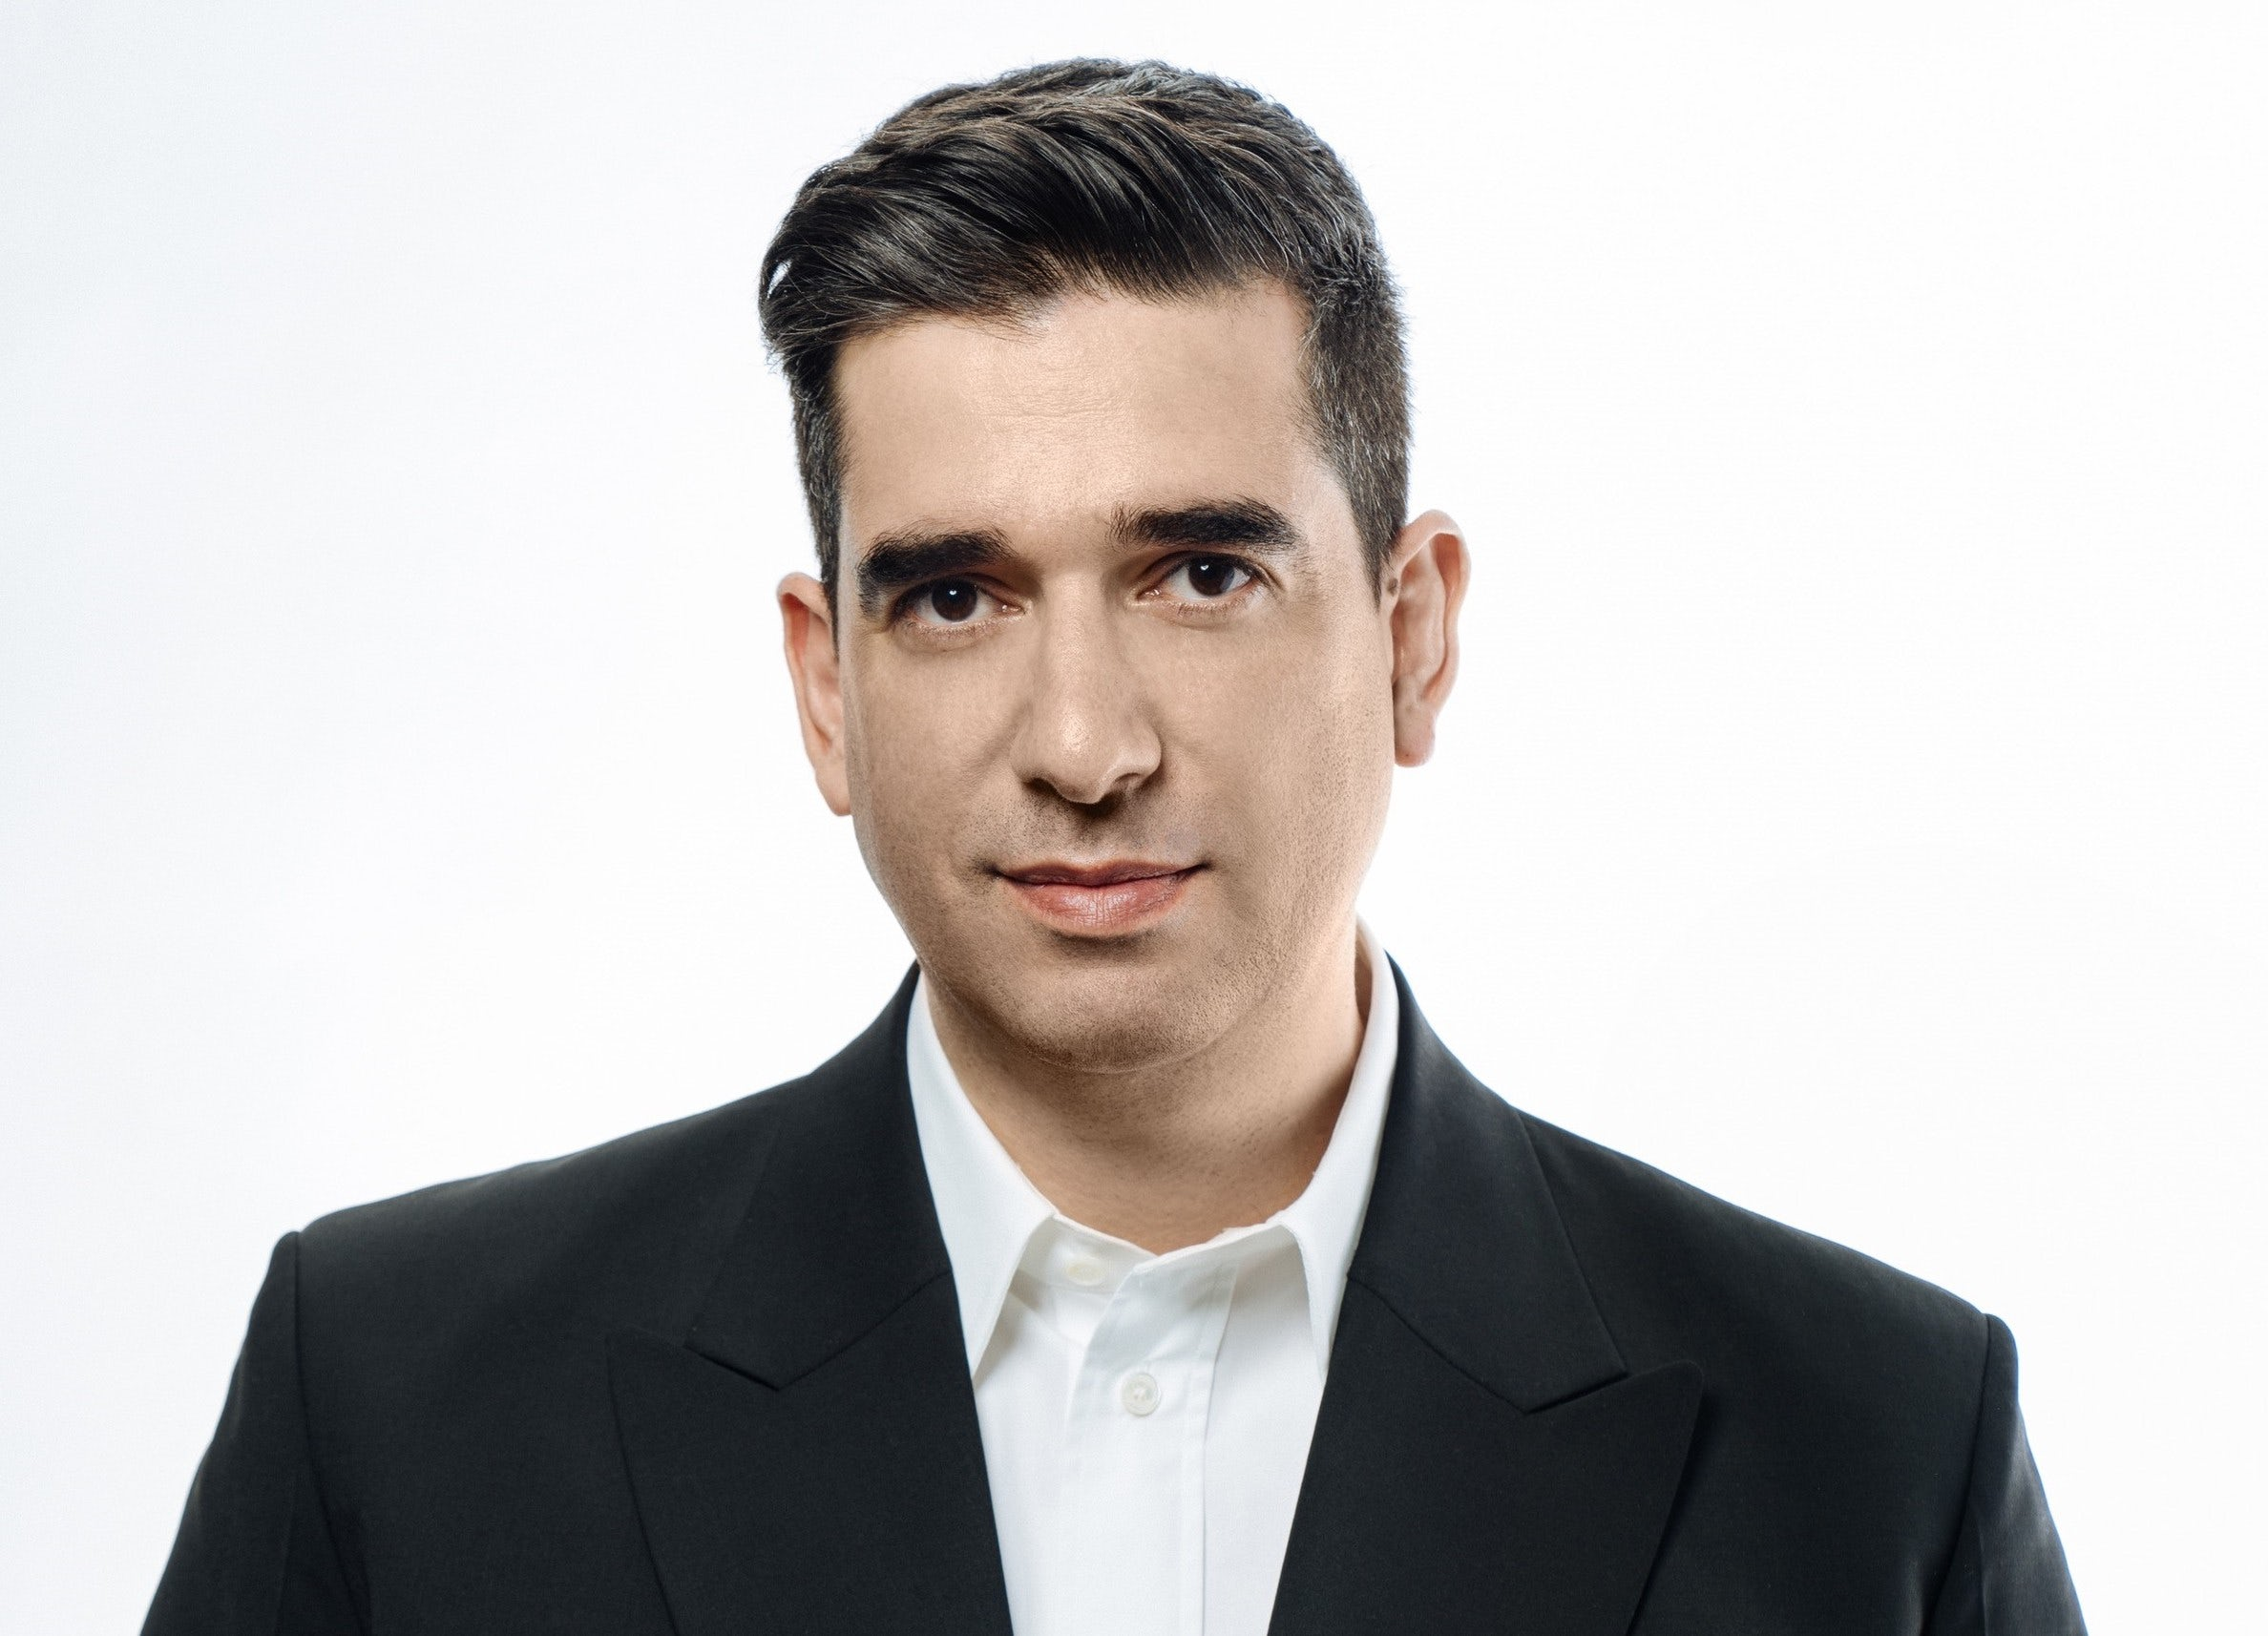 Mitchell Bacha is Valentino\'s new Greater China CEO. Valentino.